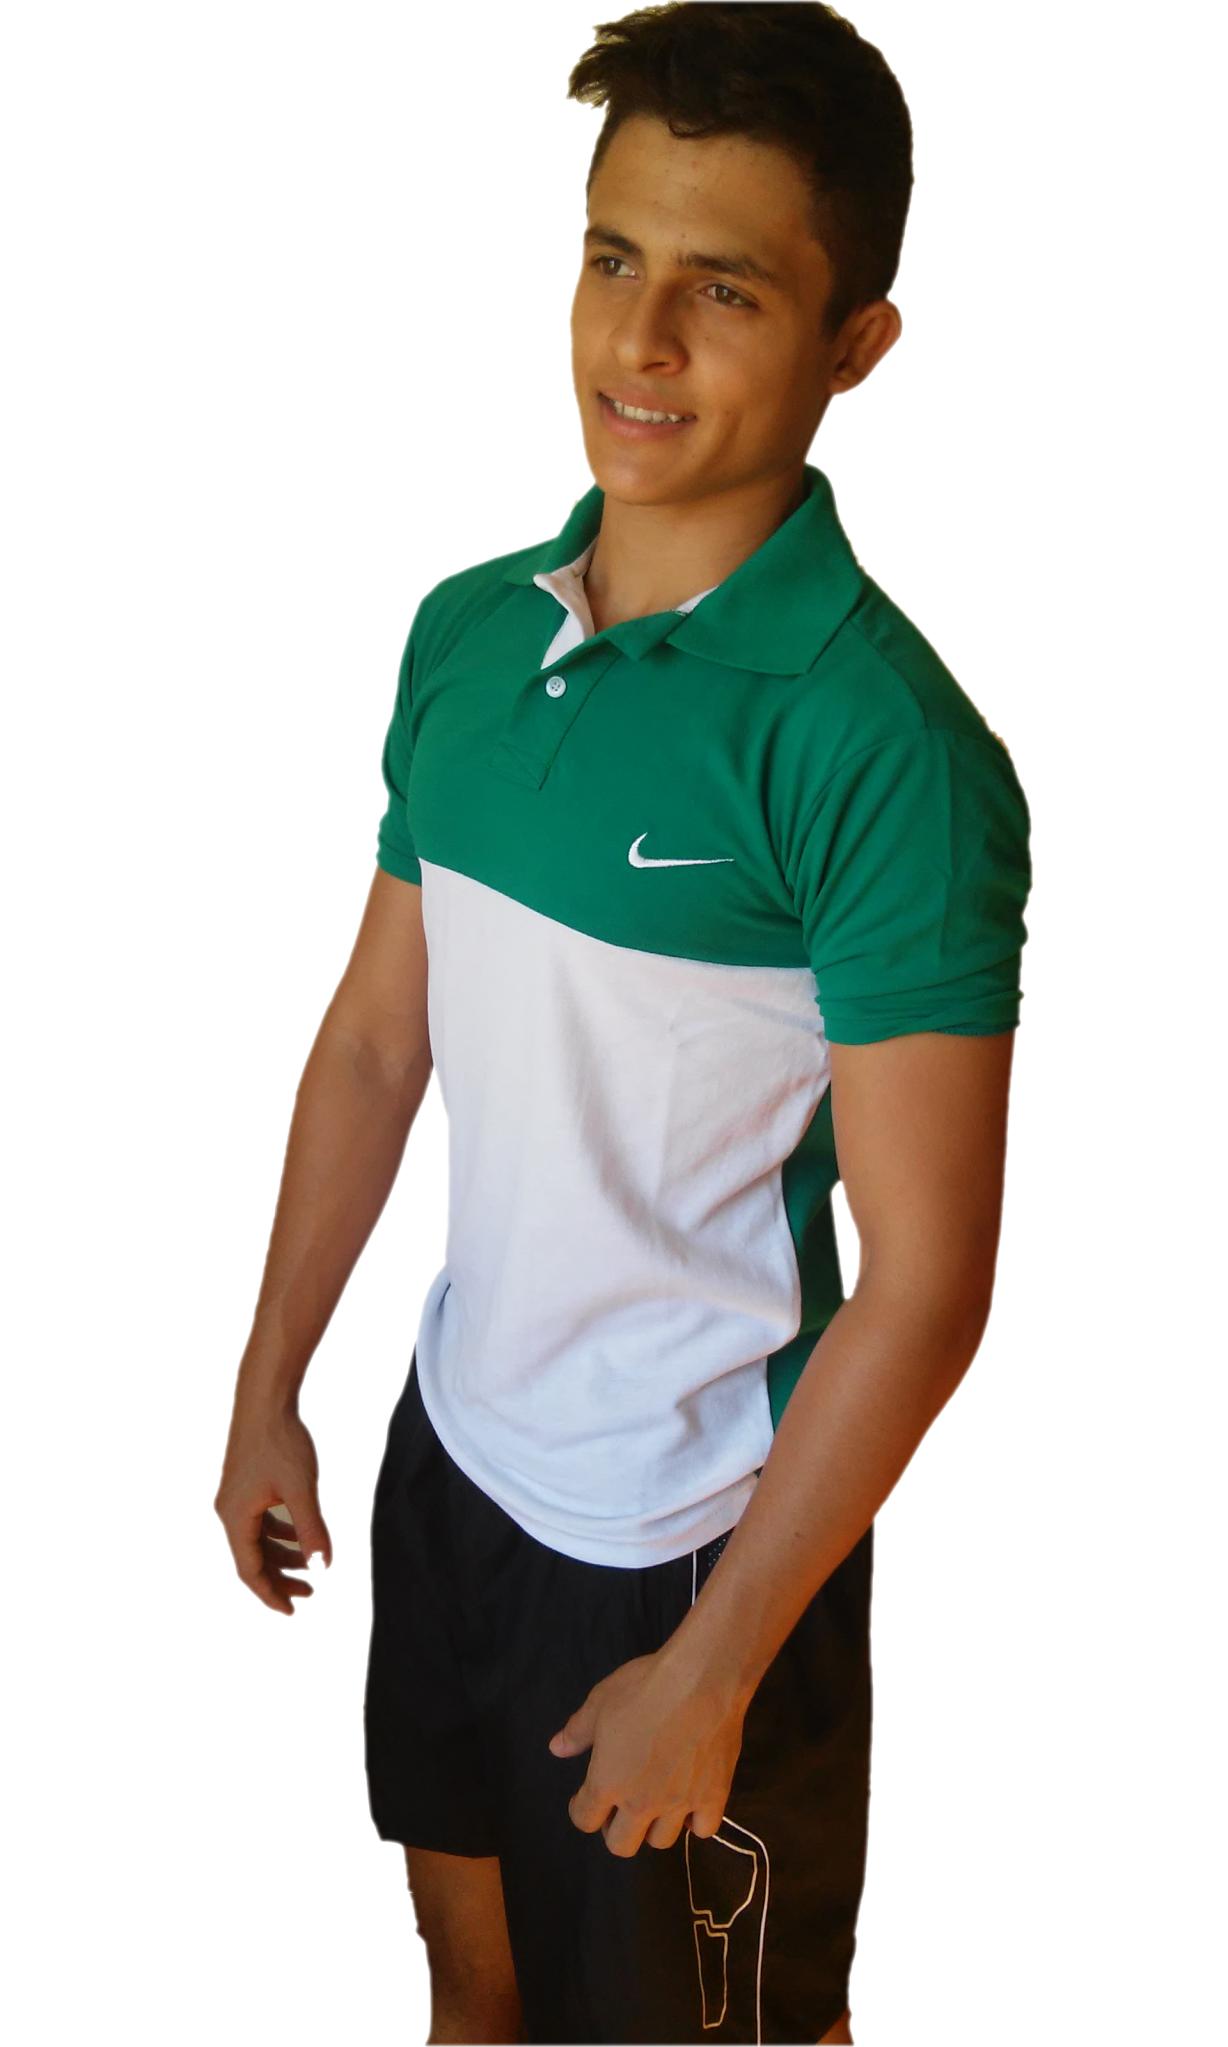 A Camisa Polo Nike Xtreme Fitness Sport Piquet Manga Curta 30% - Verde com  Branco c4222dfb0c